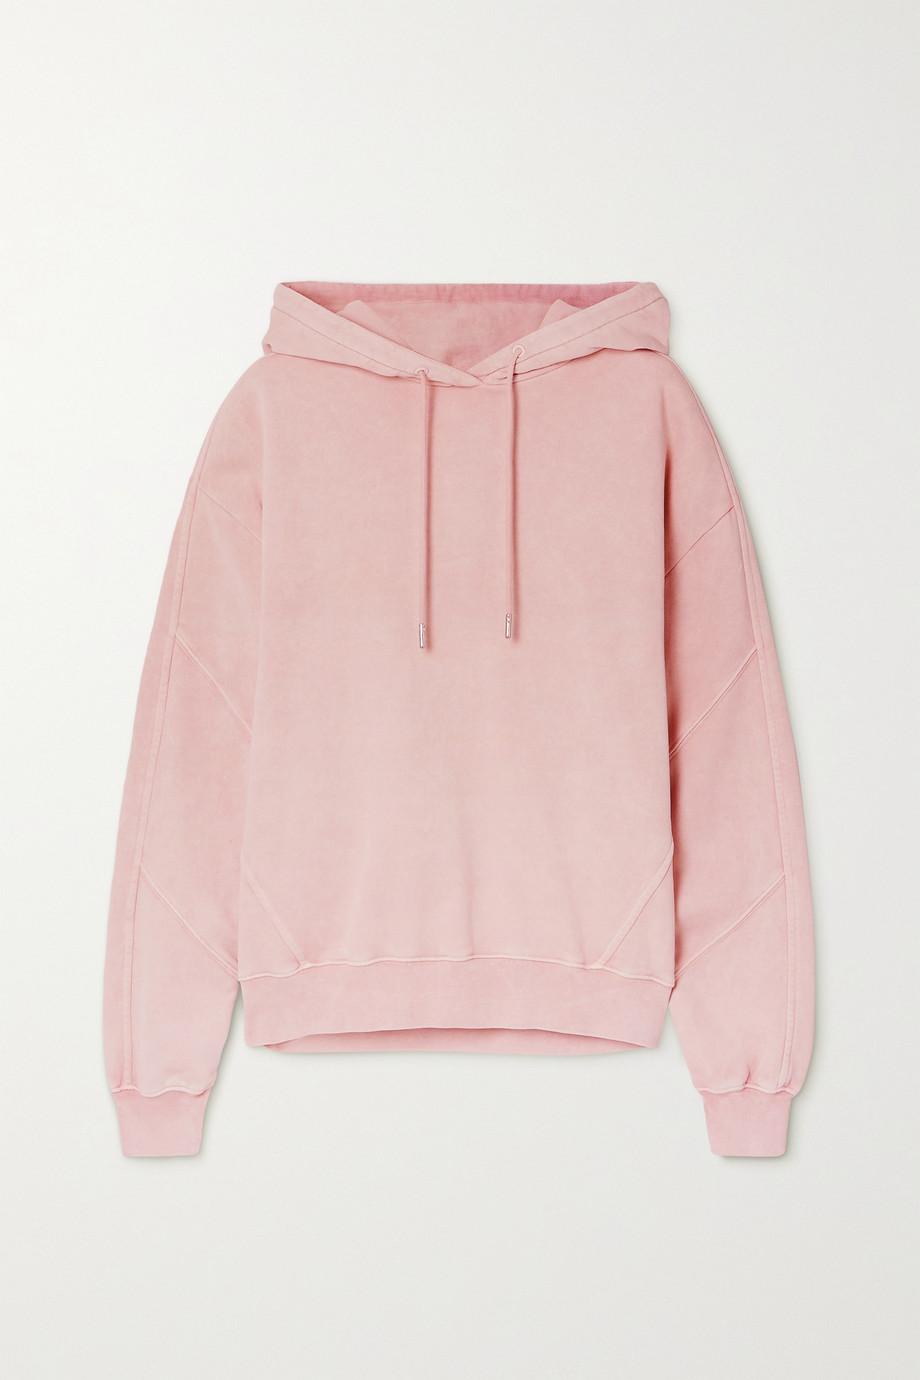 Ninety Percent + NET SUSTAIN paneled organic cotton-jersey hoodie